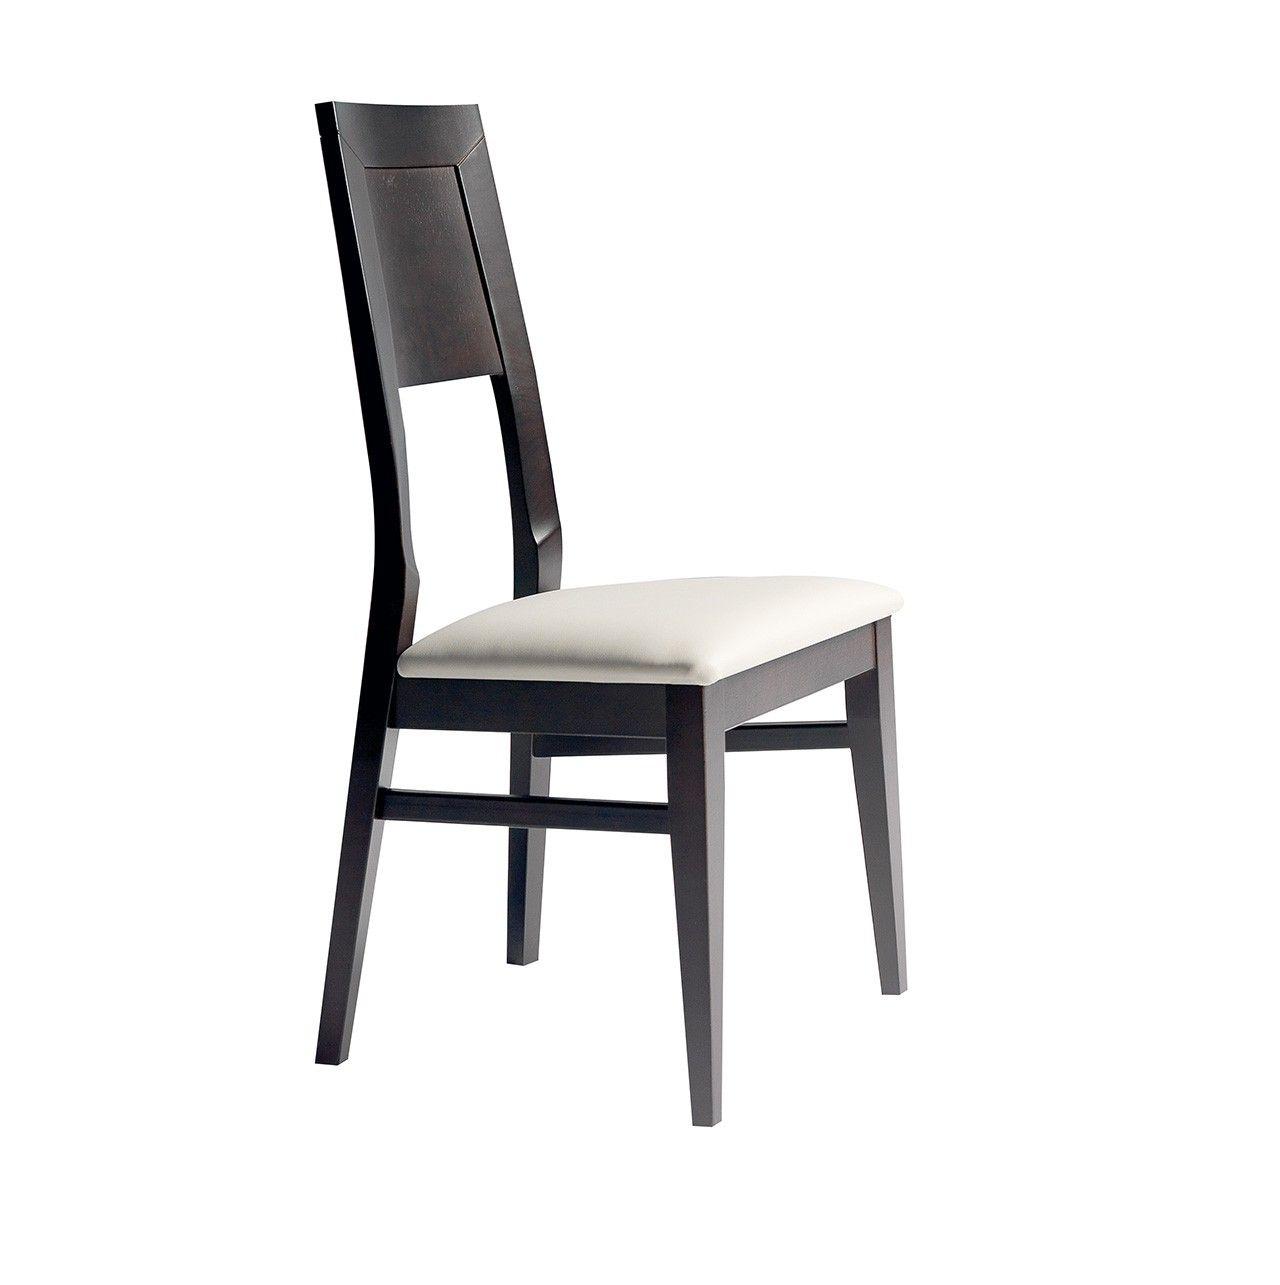 silla de madera moderna ideal para restaurante de carta On sillas de madera modernas